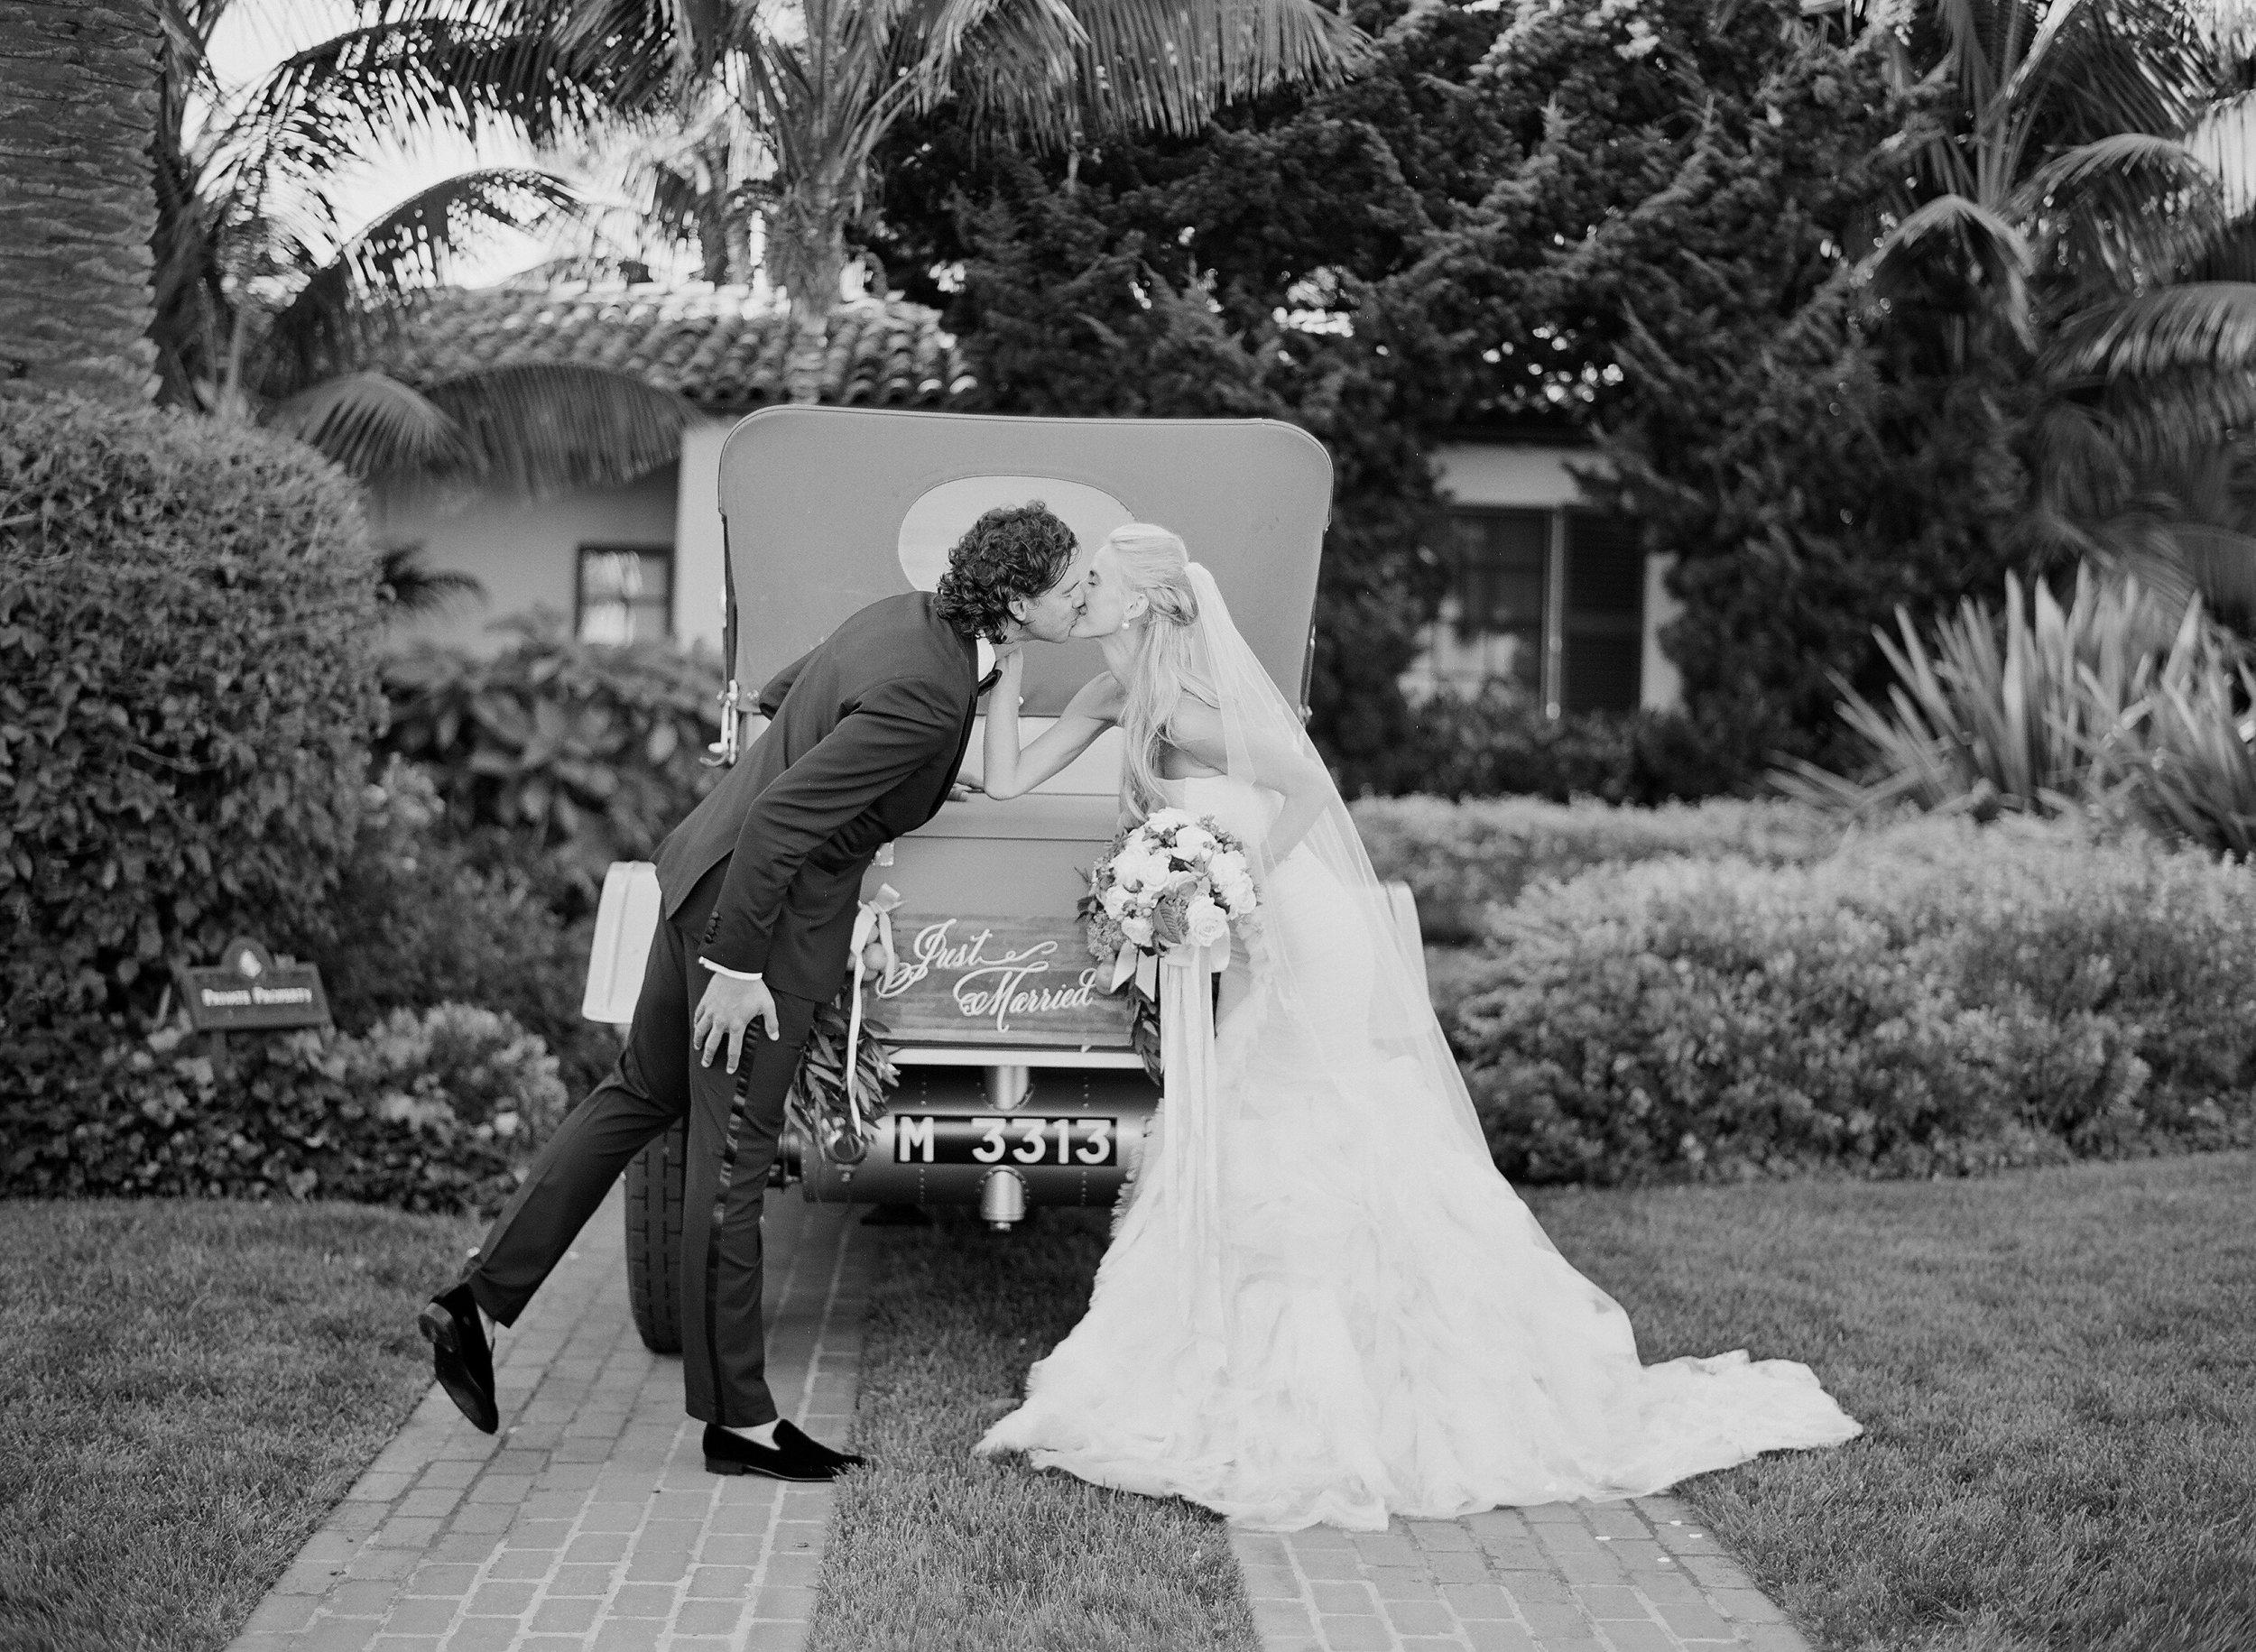 santabarbarawedding.com   Photo: Megan Sorel   Citrus Wedding Ideas at the Santa Barbara Four Seasons